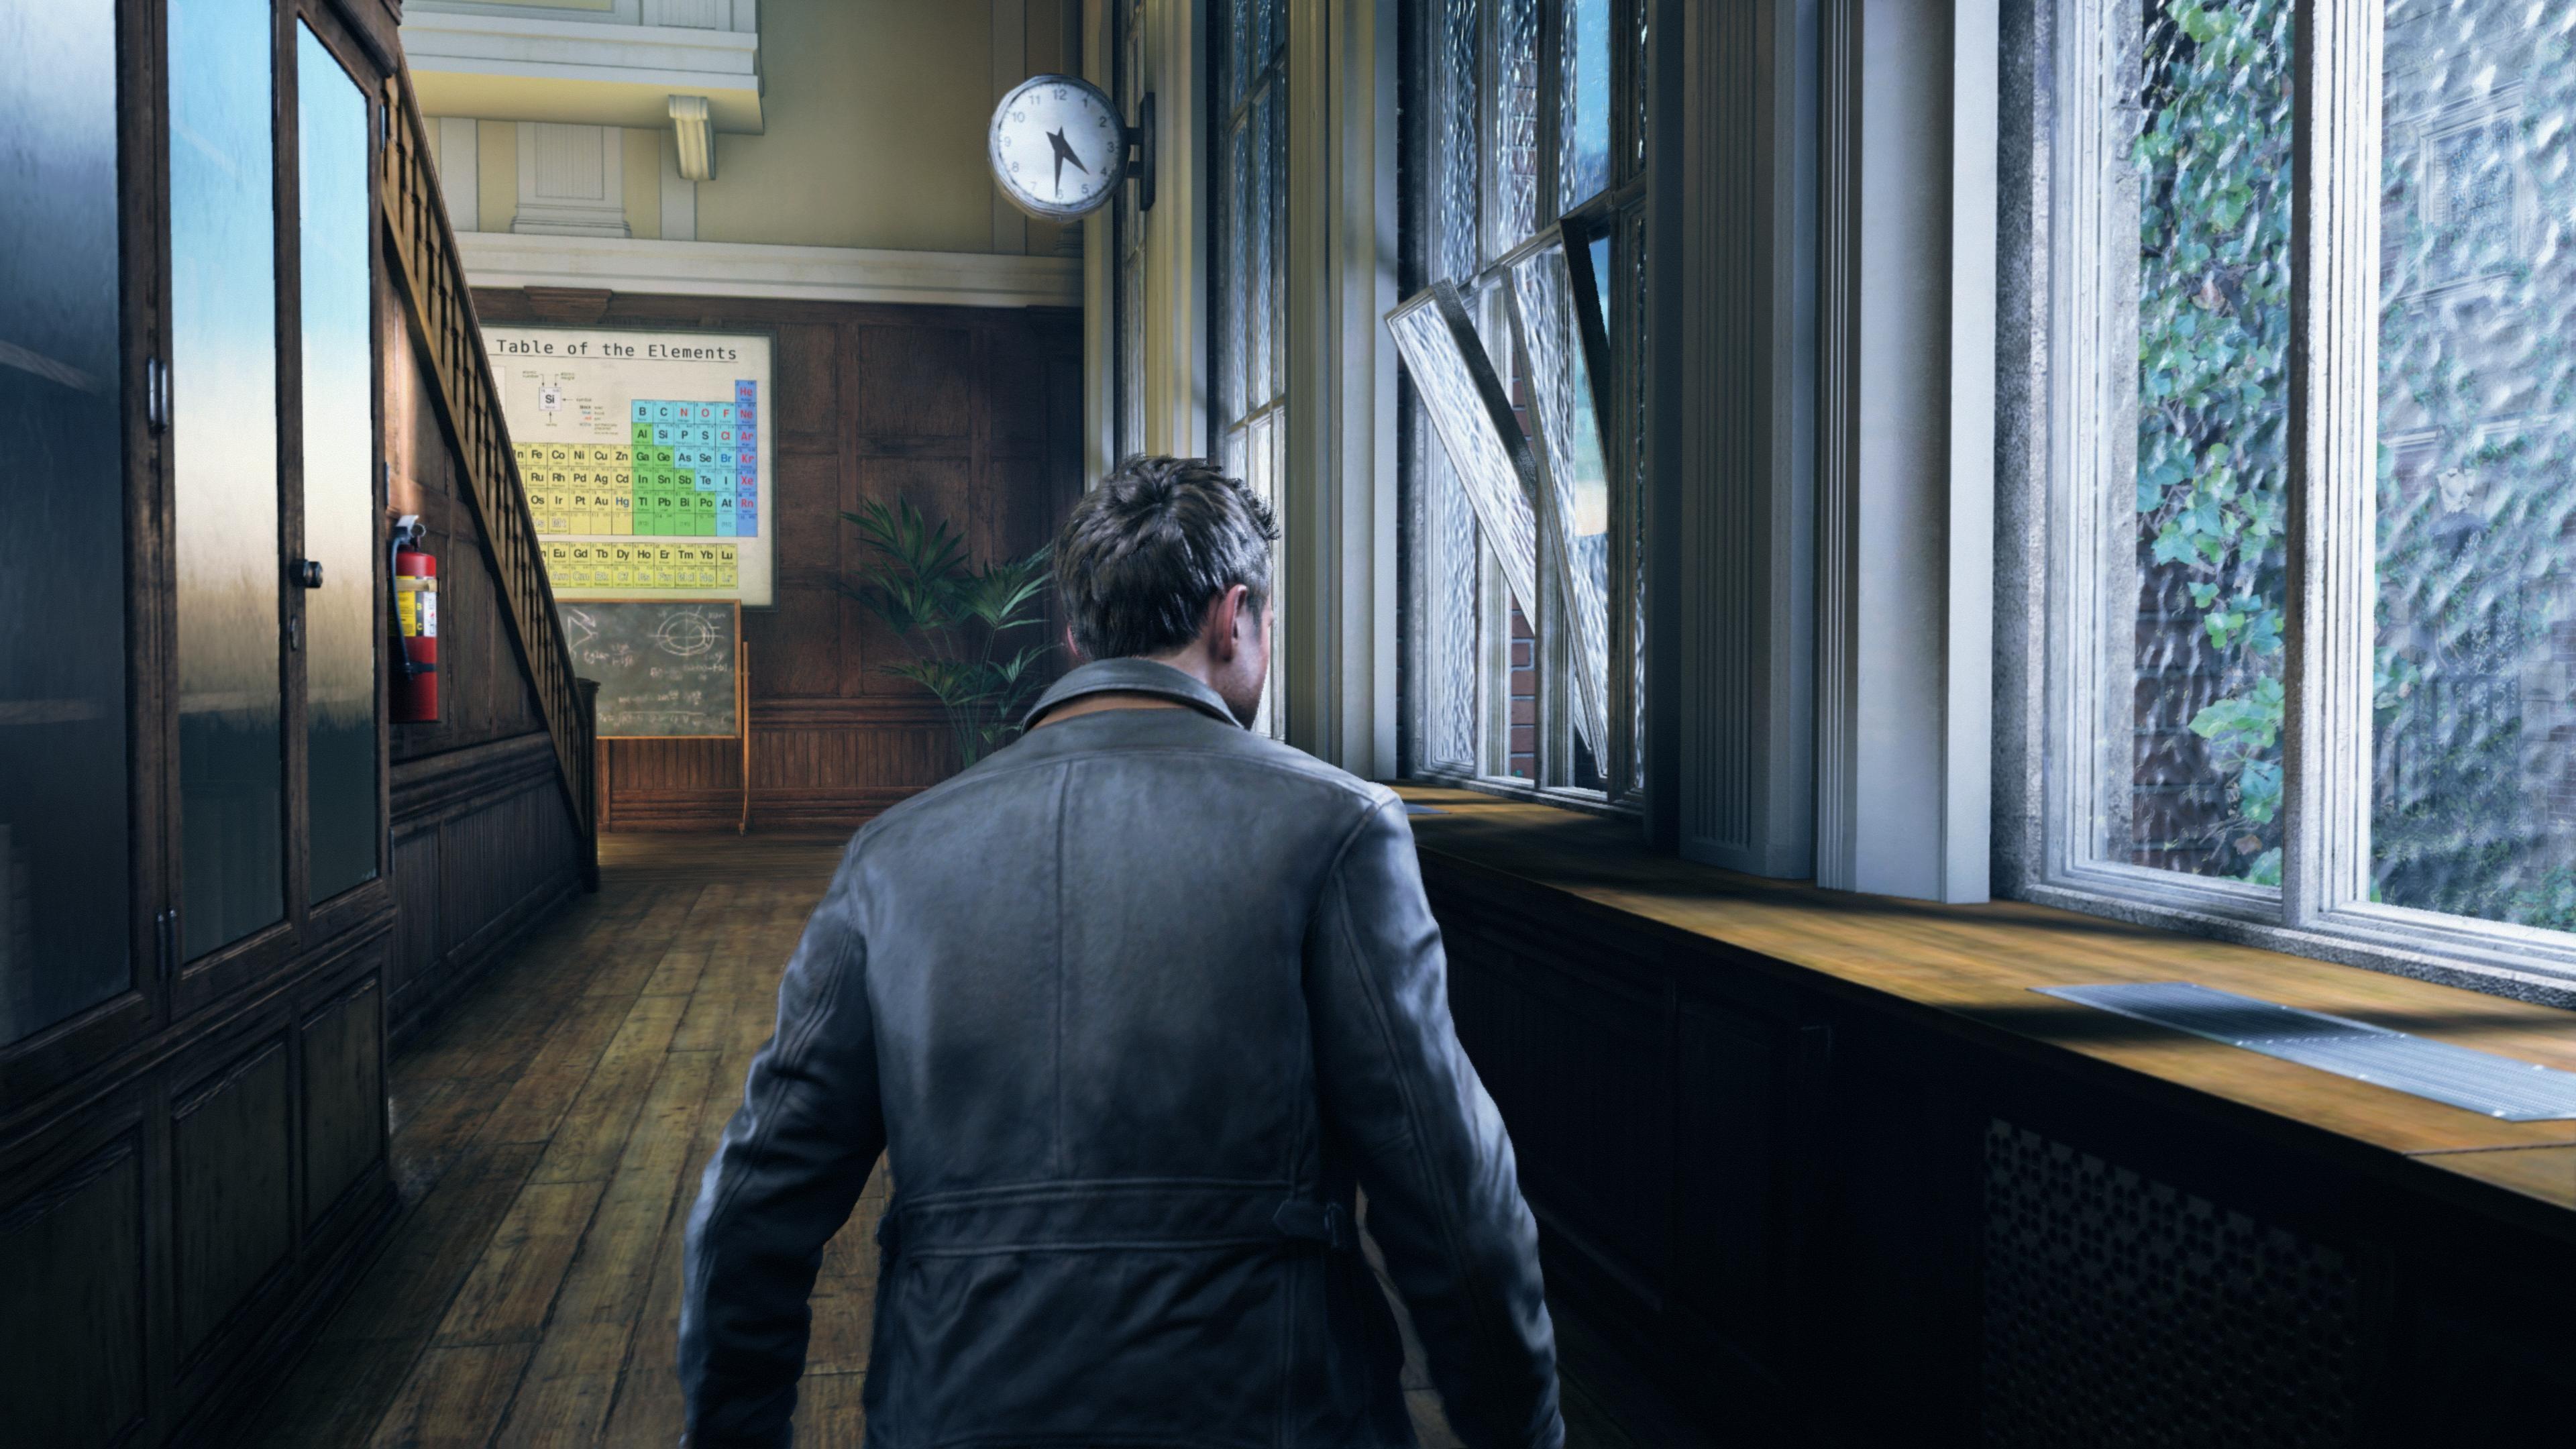 Download 4k Wallpapers Of Cars Wallpaper Quantum Break Shooter Xbox One Best Shooter